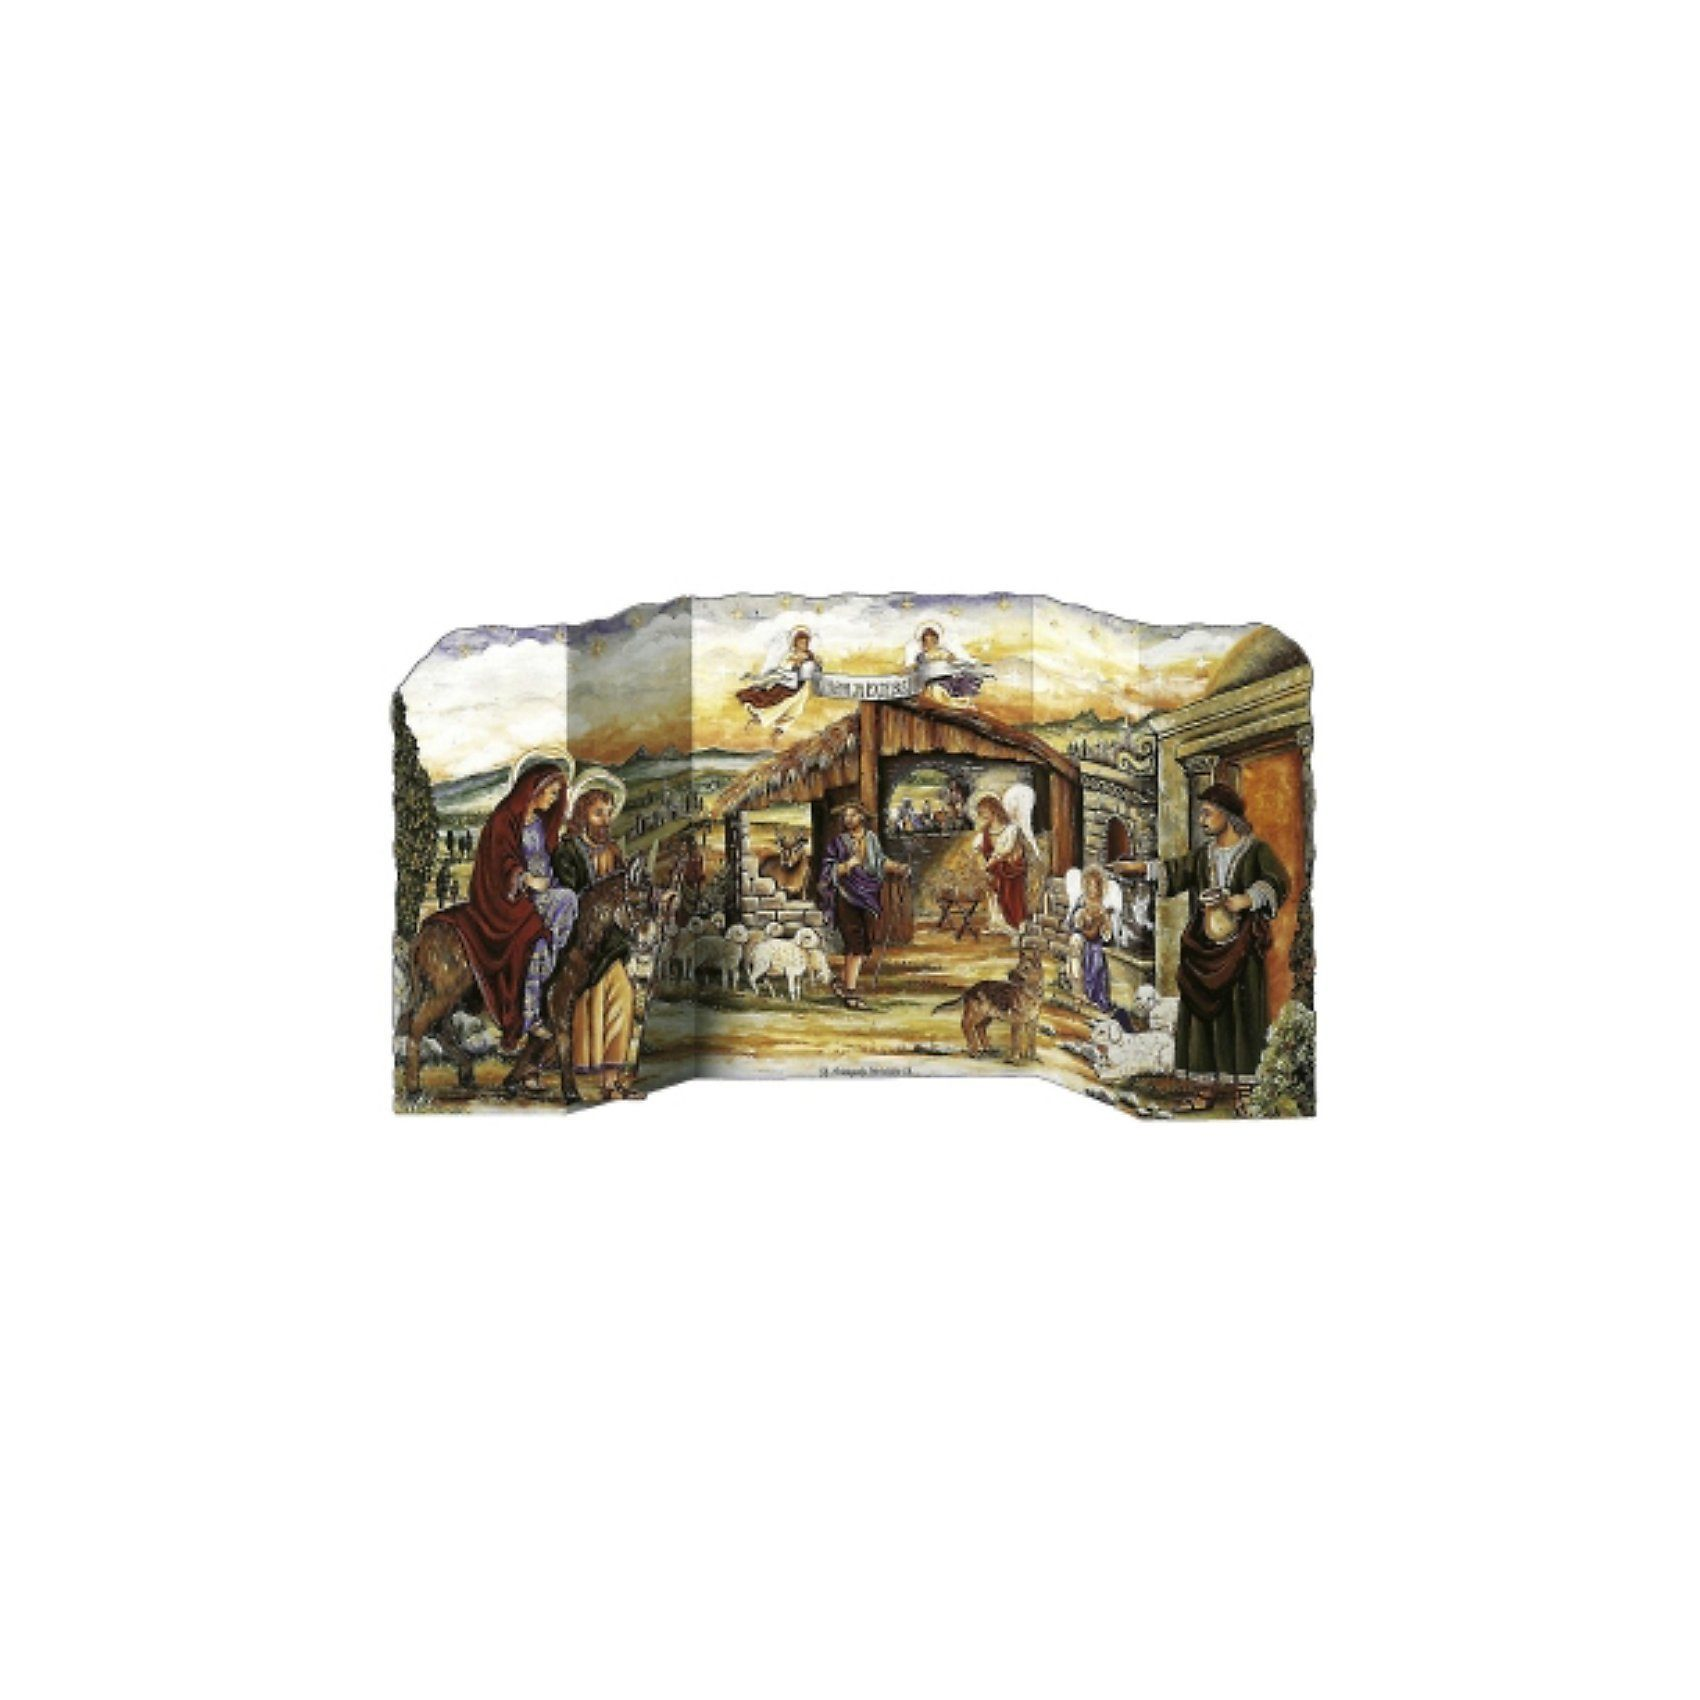 Korsch Verlag Herbergssuche, Adventskalender (27 x 57 cm)